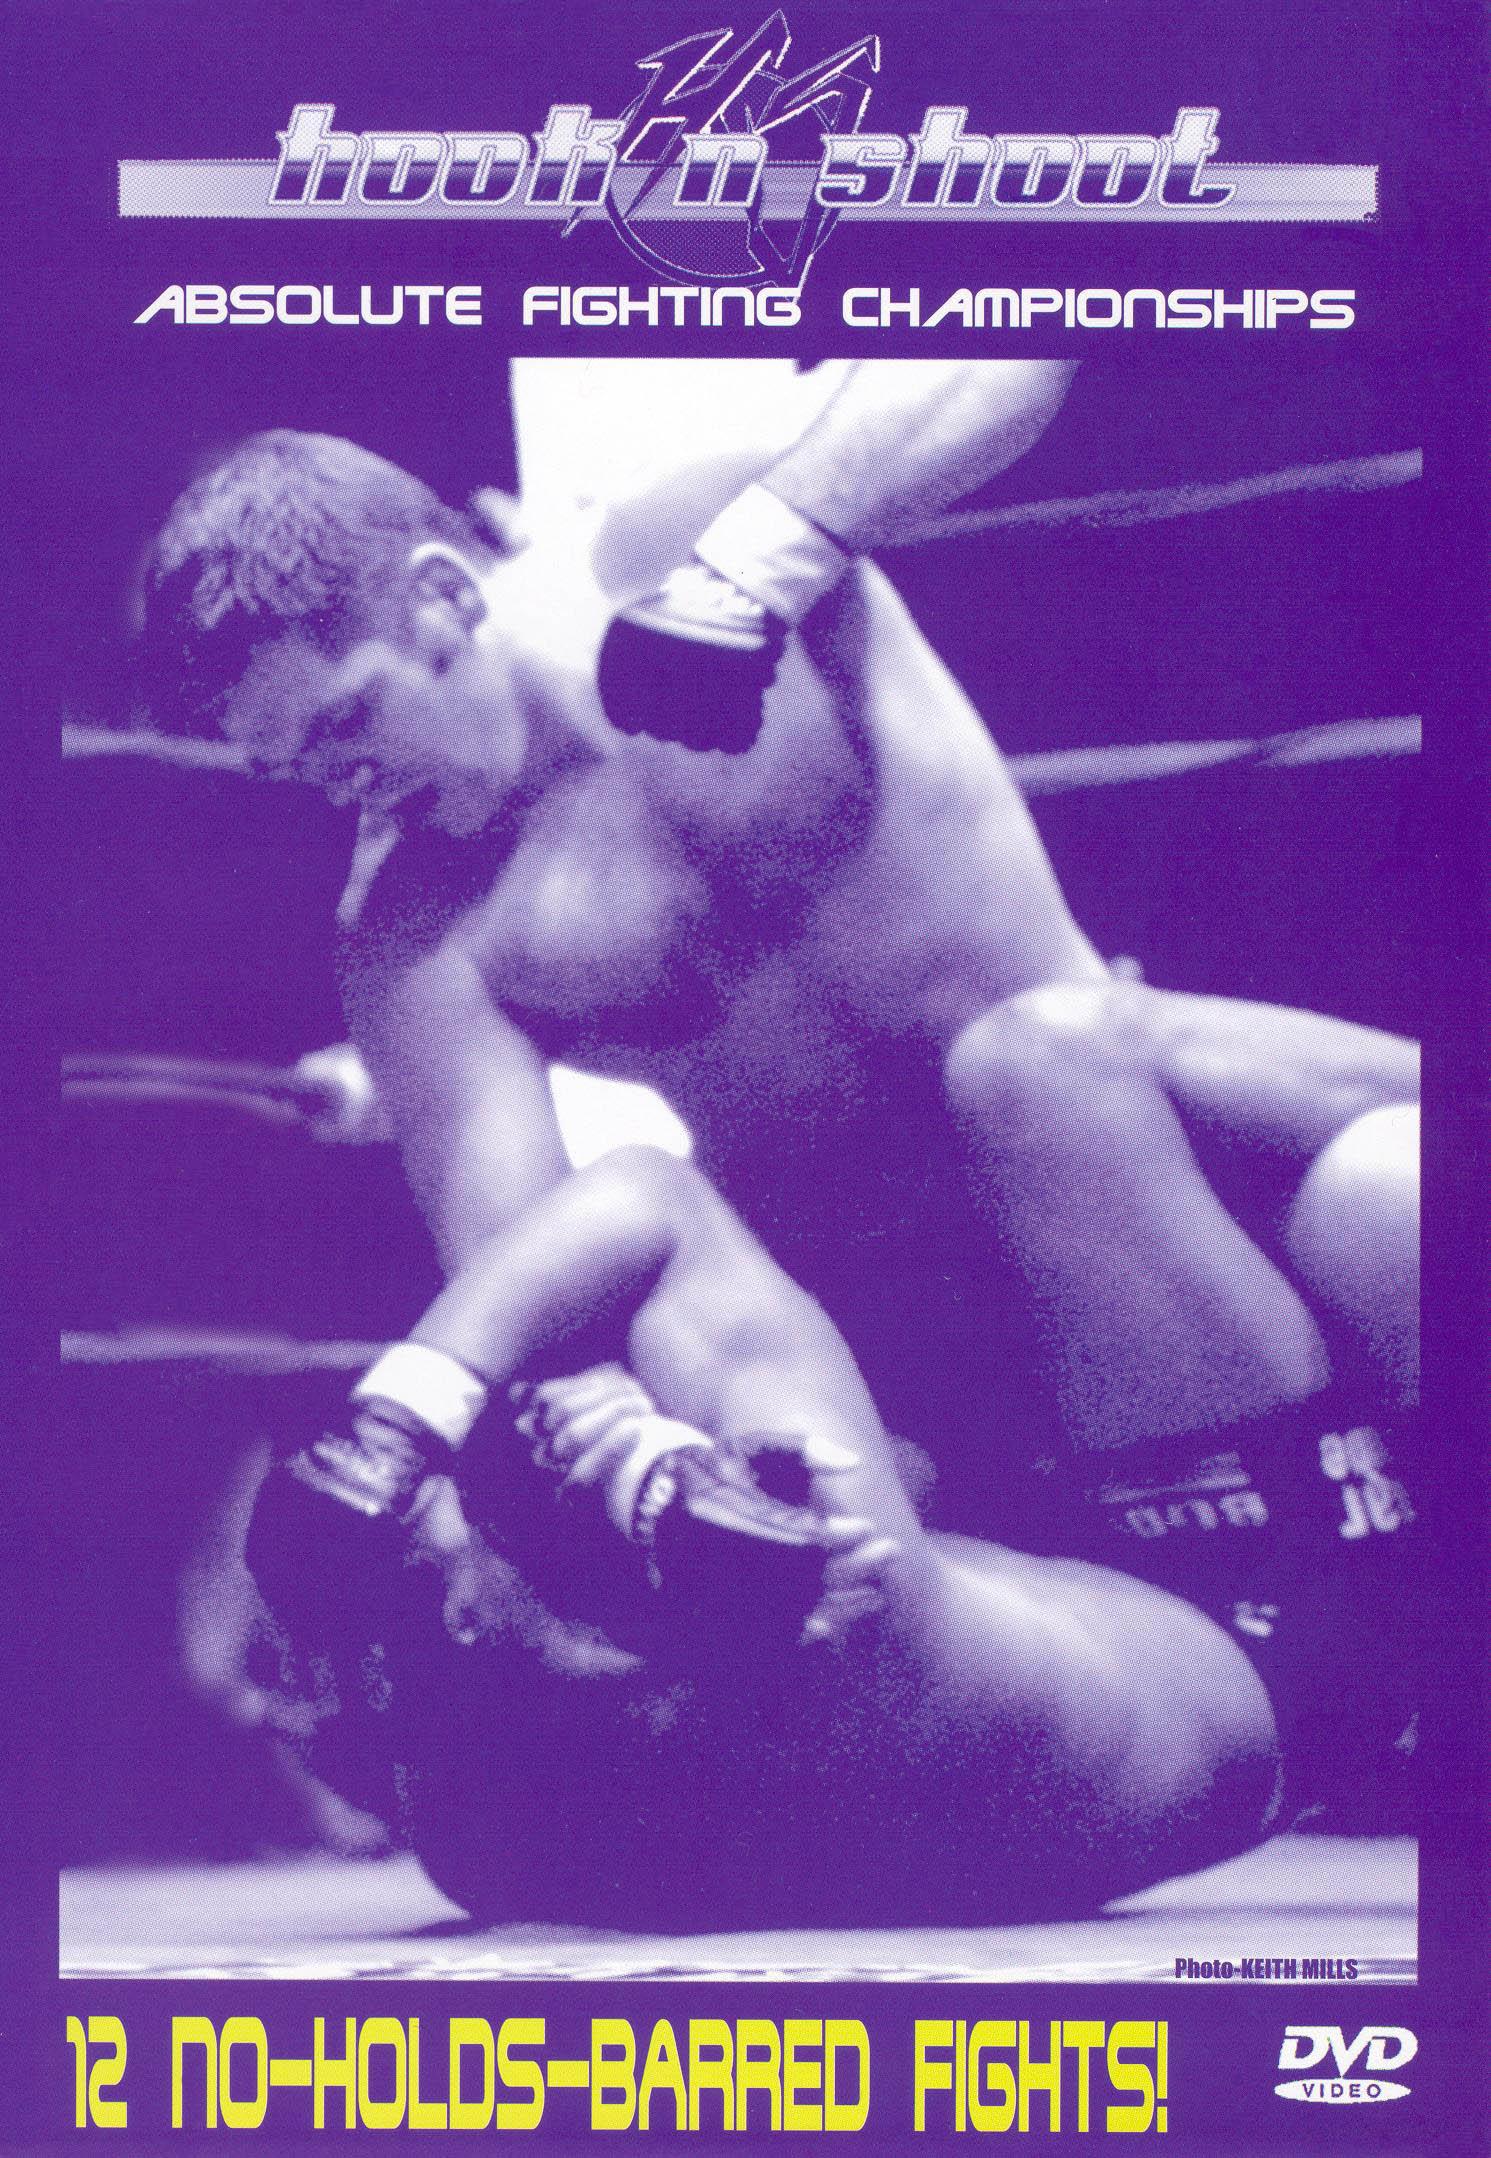 HooknShoot: Absolute Fighting Championships, Vol. 1